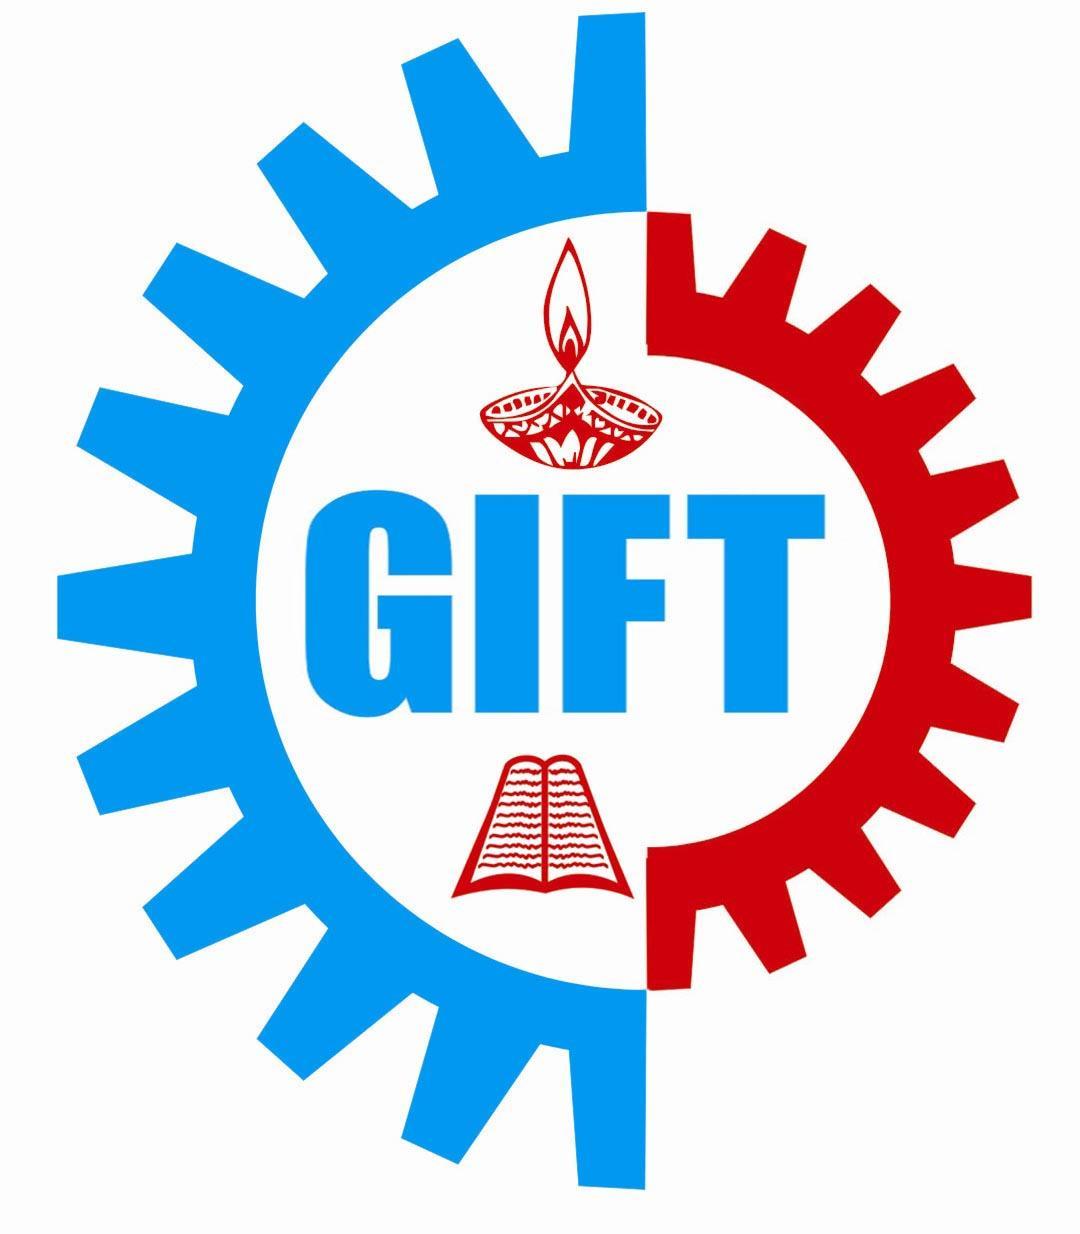 GIFT - Gandhi Institute For Technology